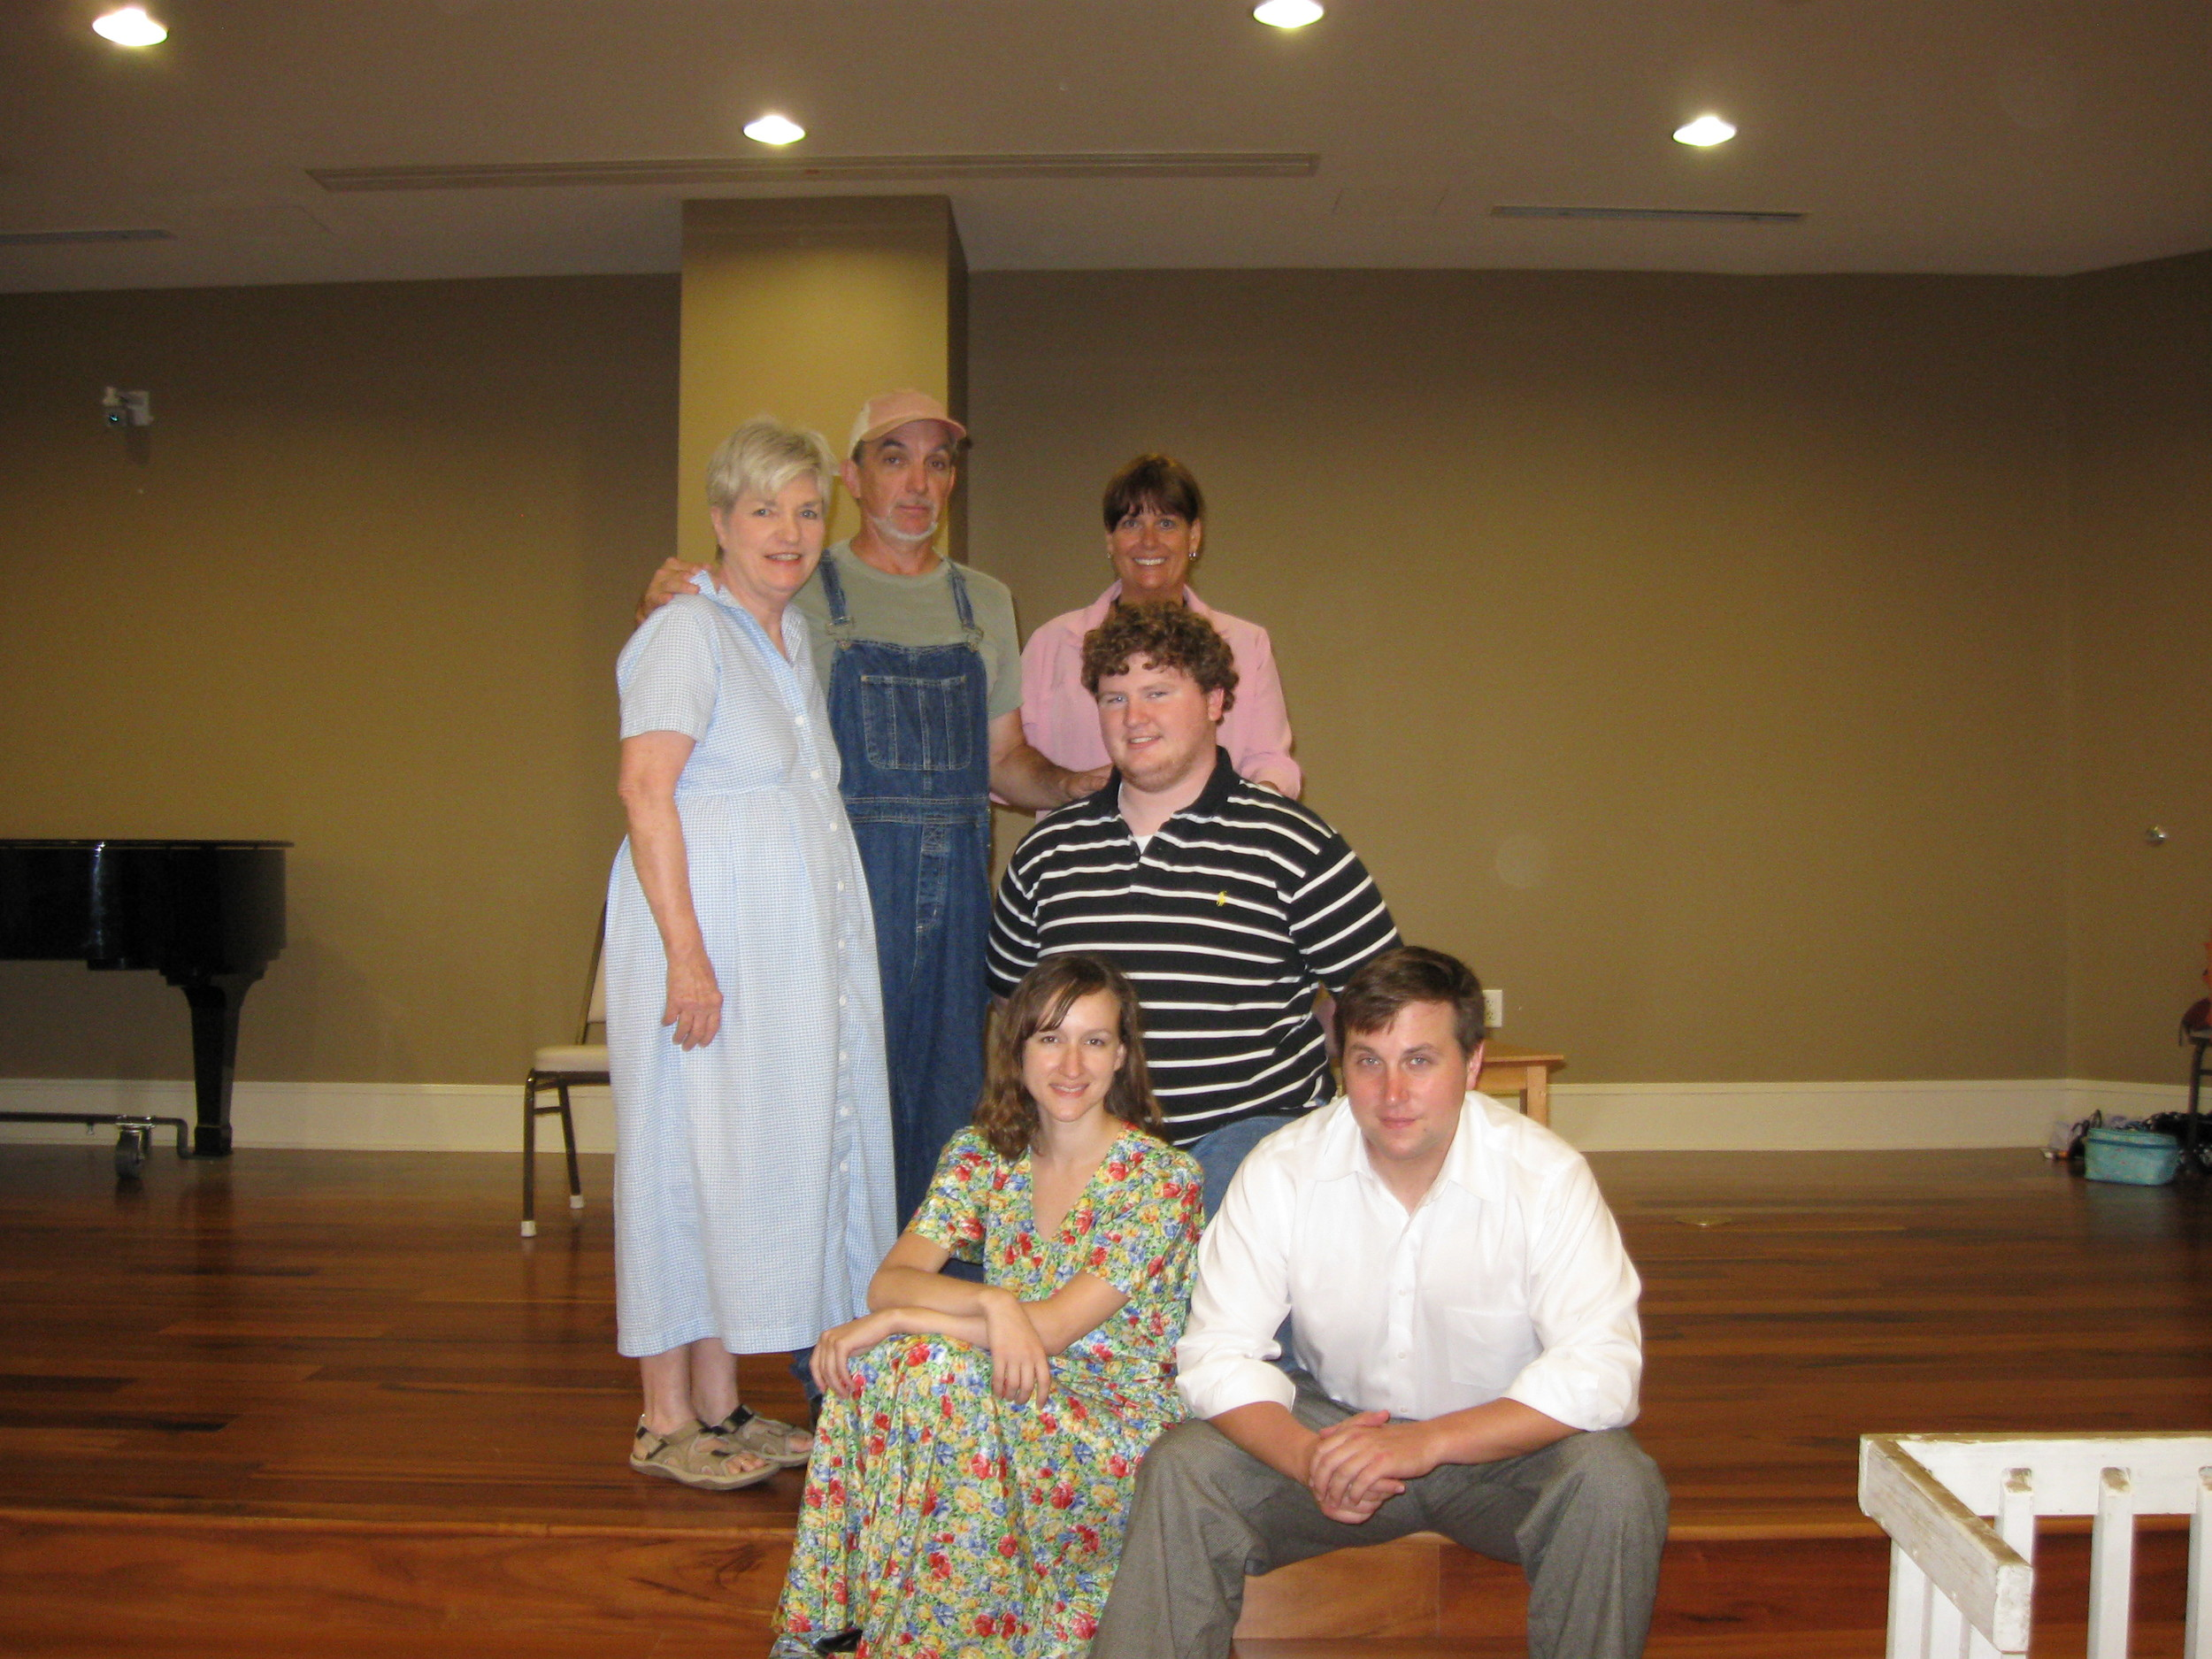 Pat Smith (Ma),  Dennis Colburn (Al aka: Pa), Patty Meredith (Stage Manager), Garrett Mann (Al Jr. - my bro), me (Jenny), Sebastian Daskawicz-Davis (Homer - my love interest)